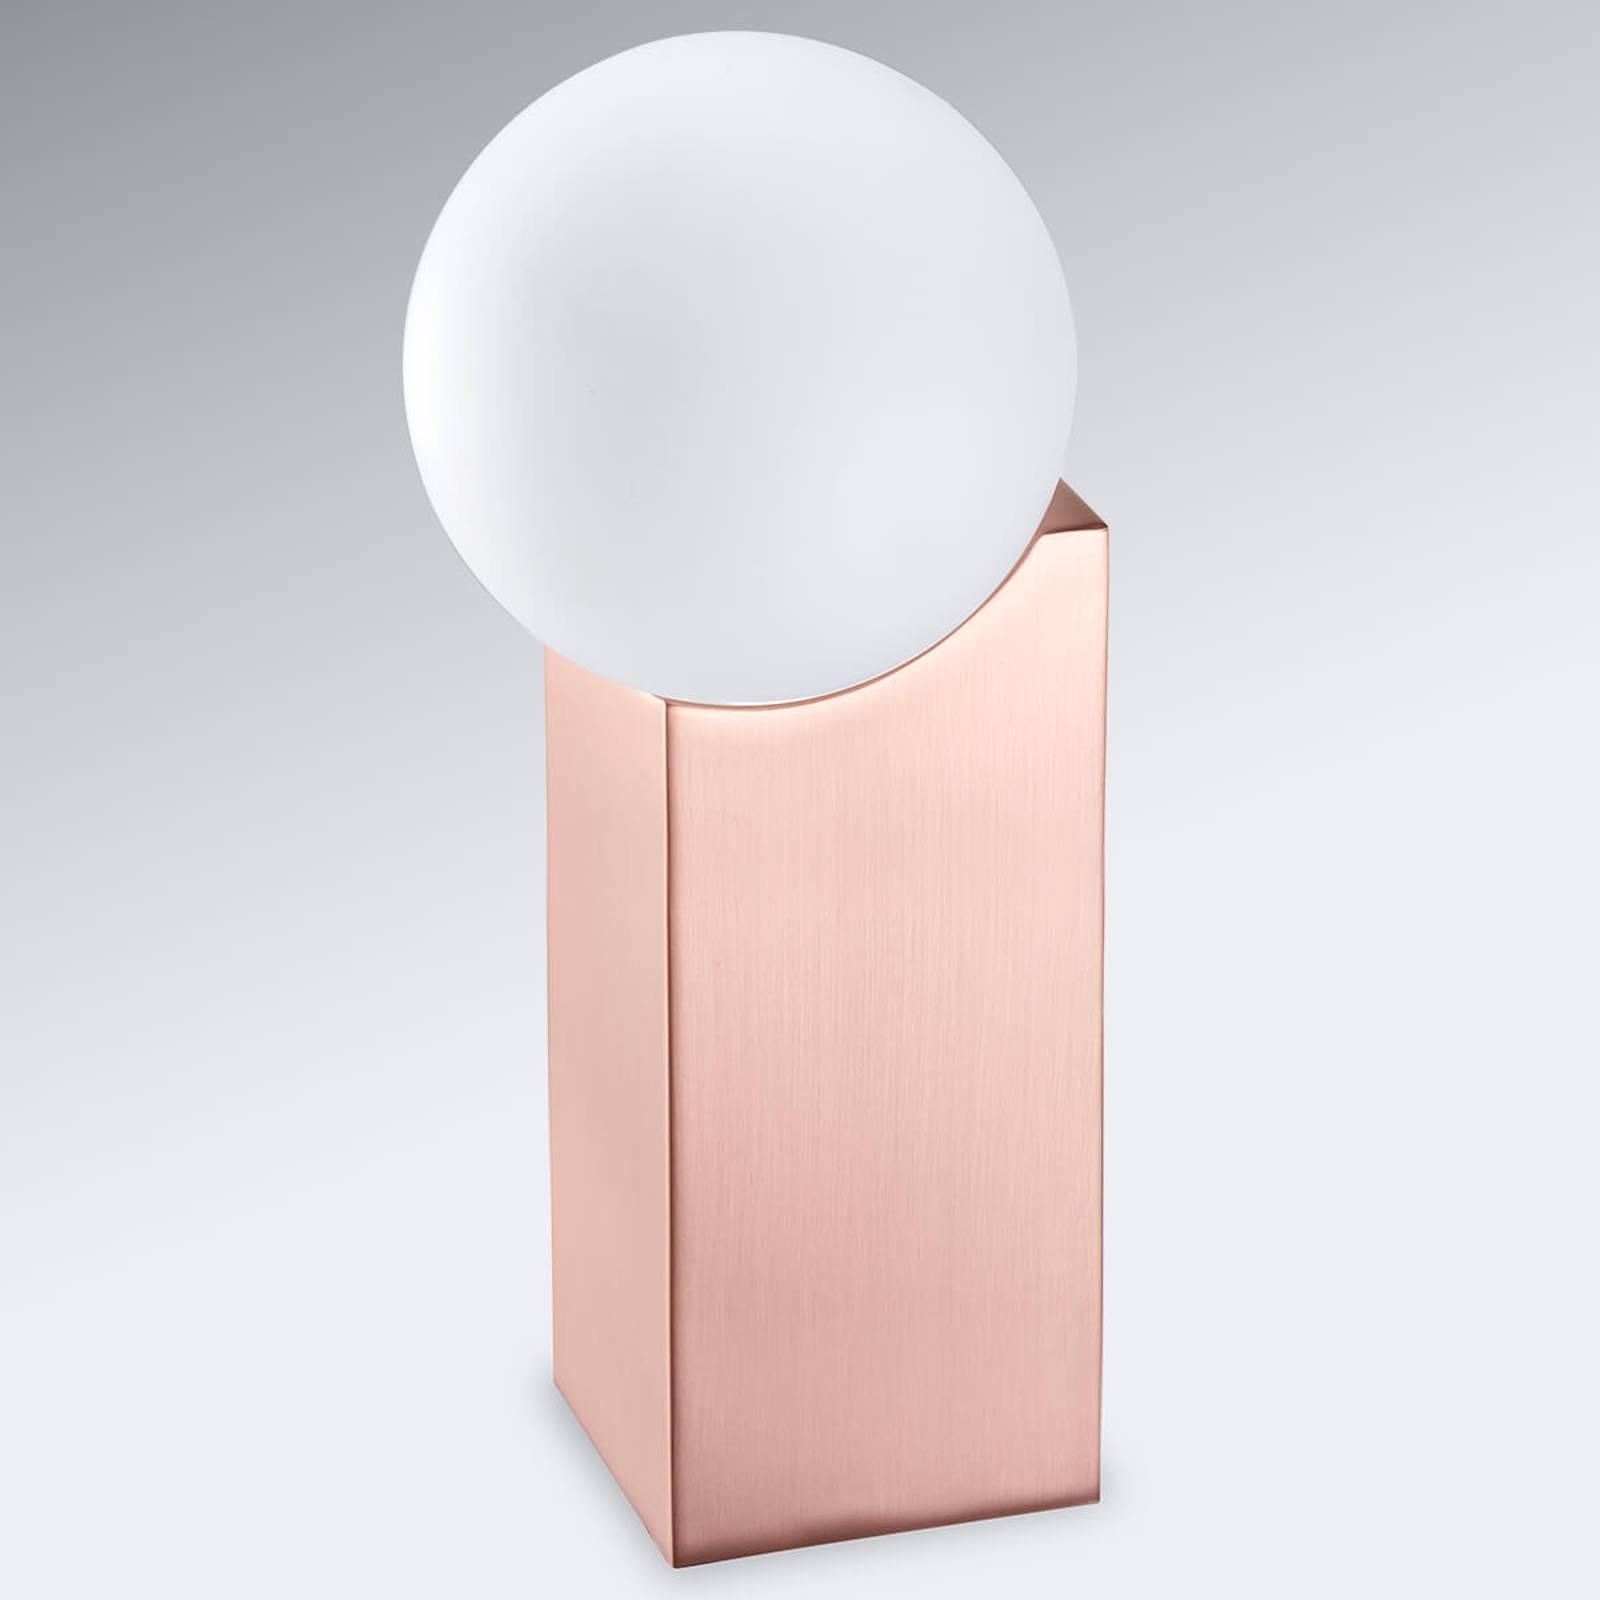 Pöytälamppu Cub 23,5 cm, kupari